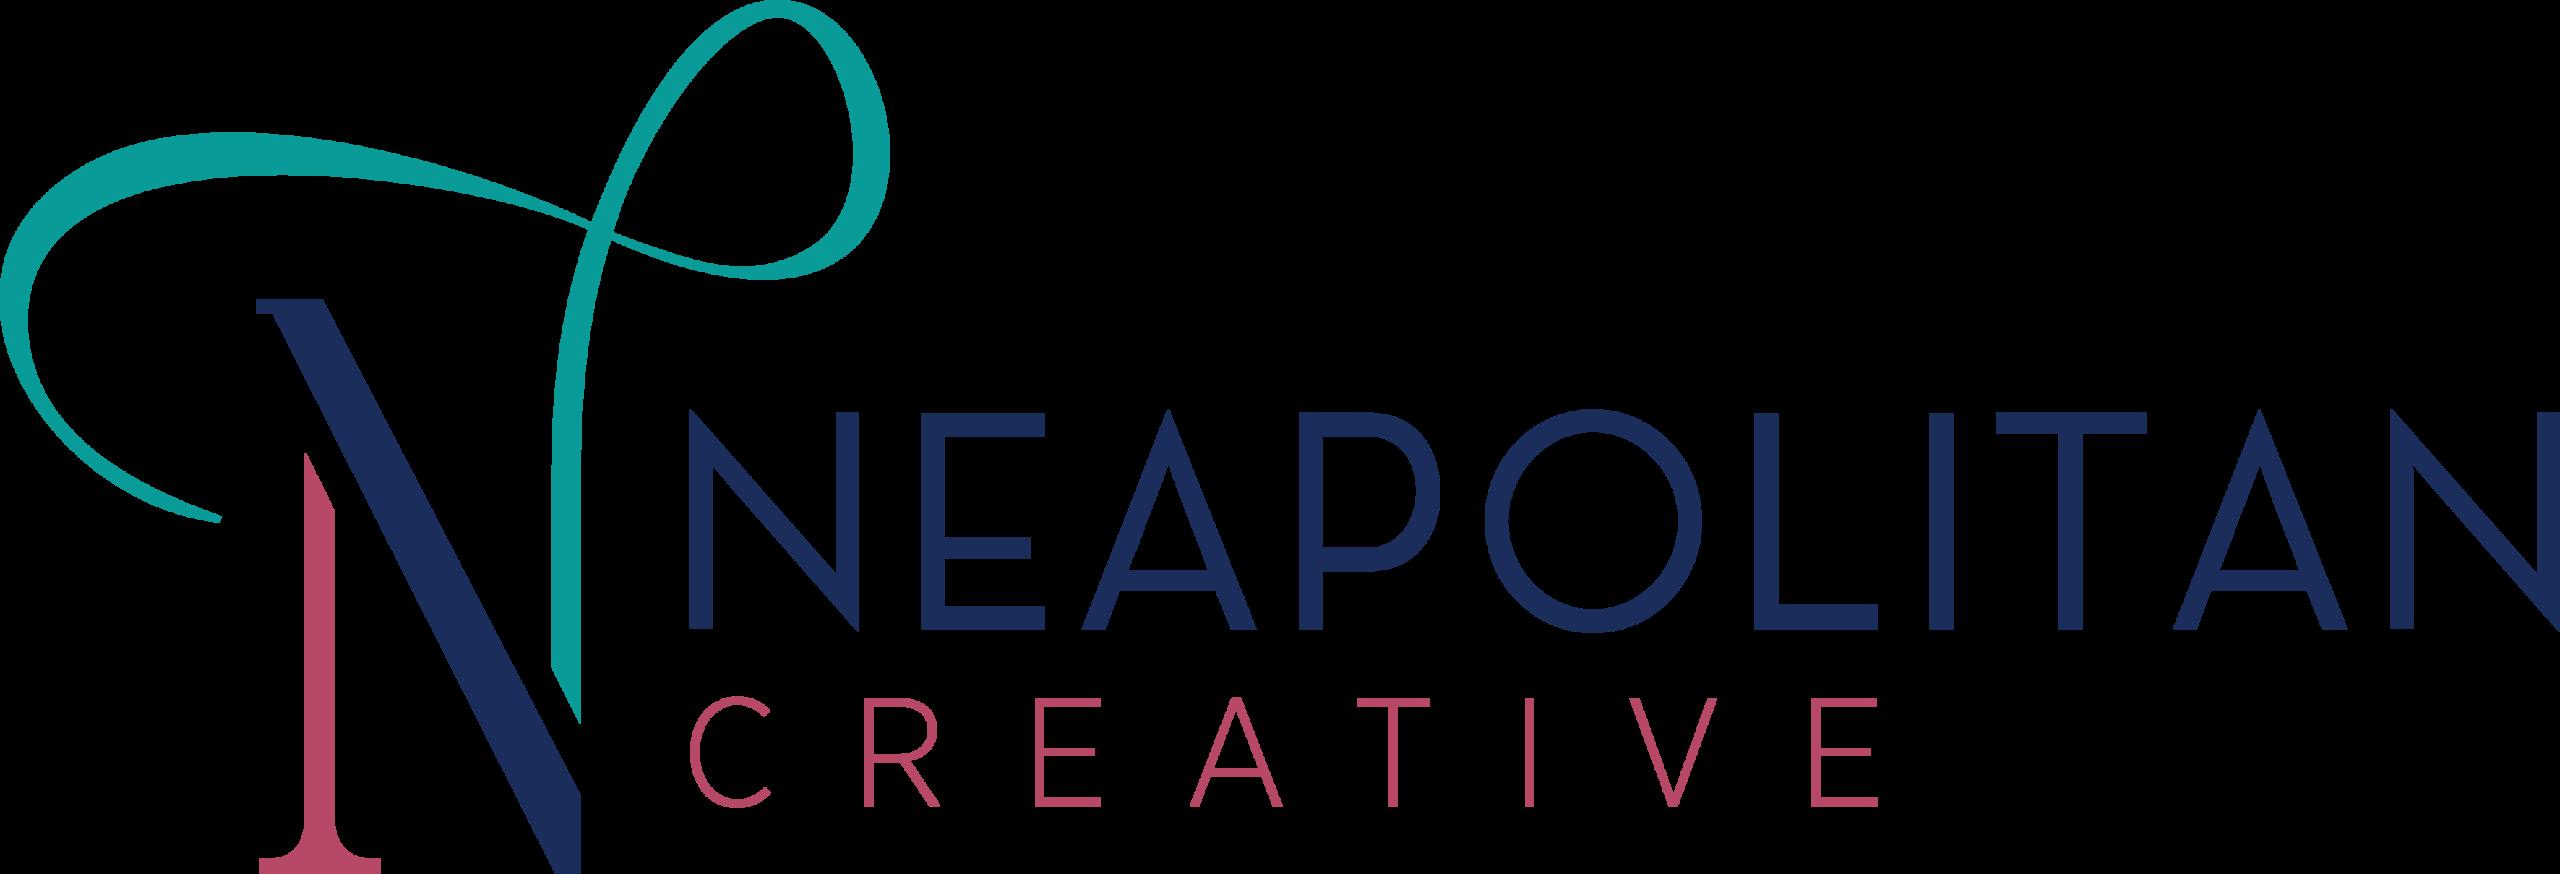 neapolitan-creative-logo-full-color-rgb